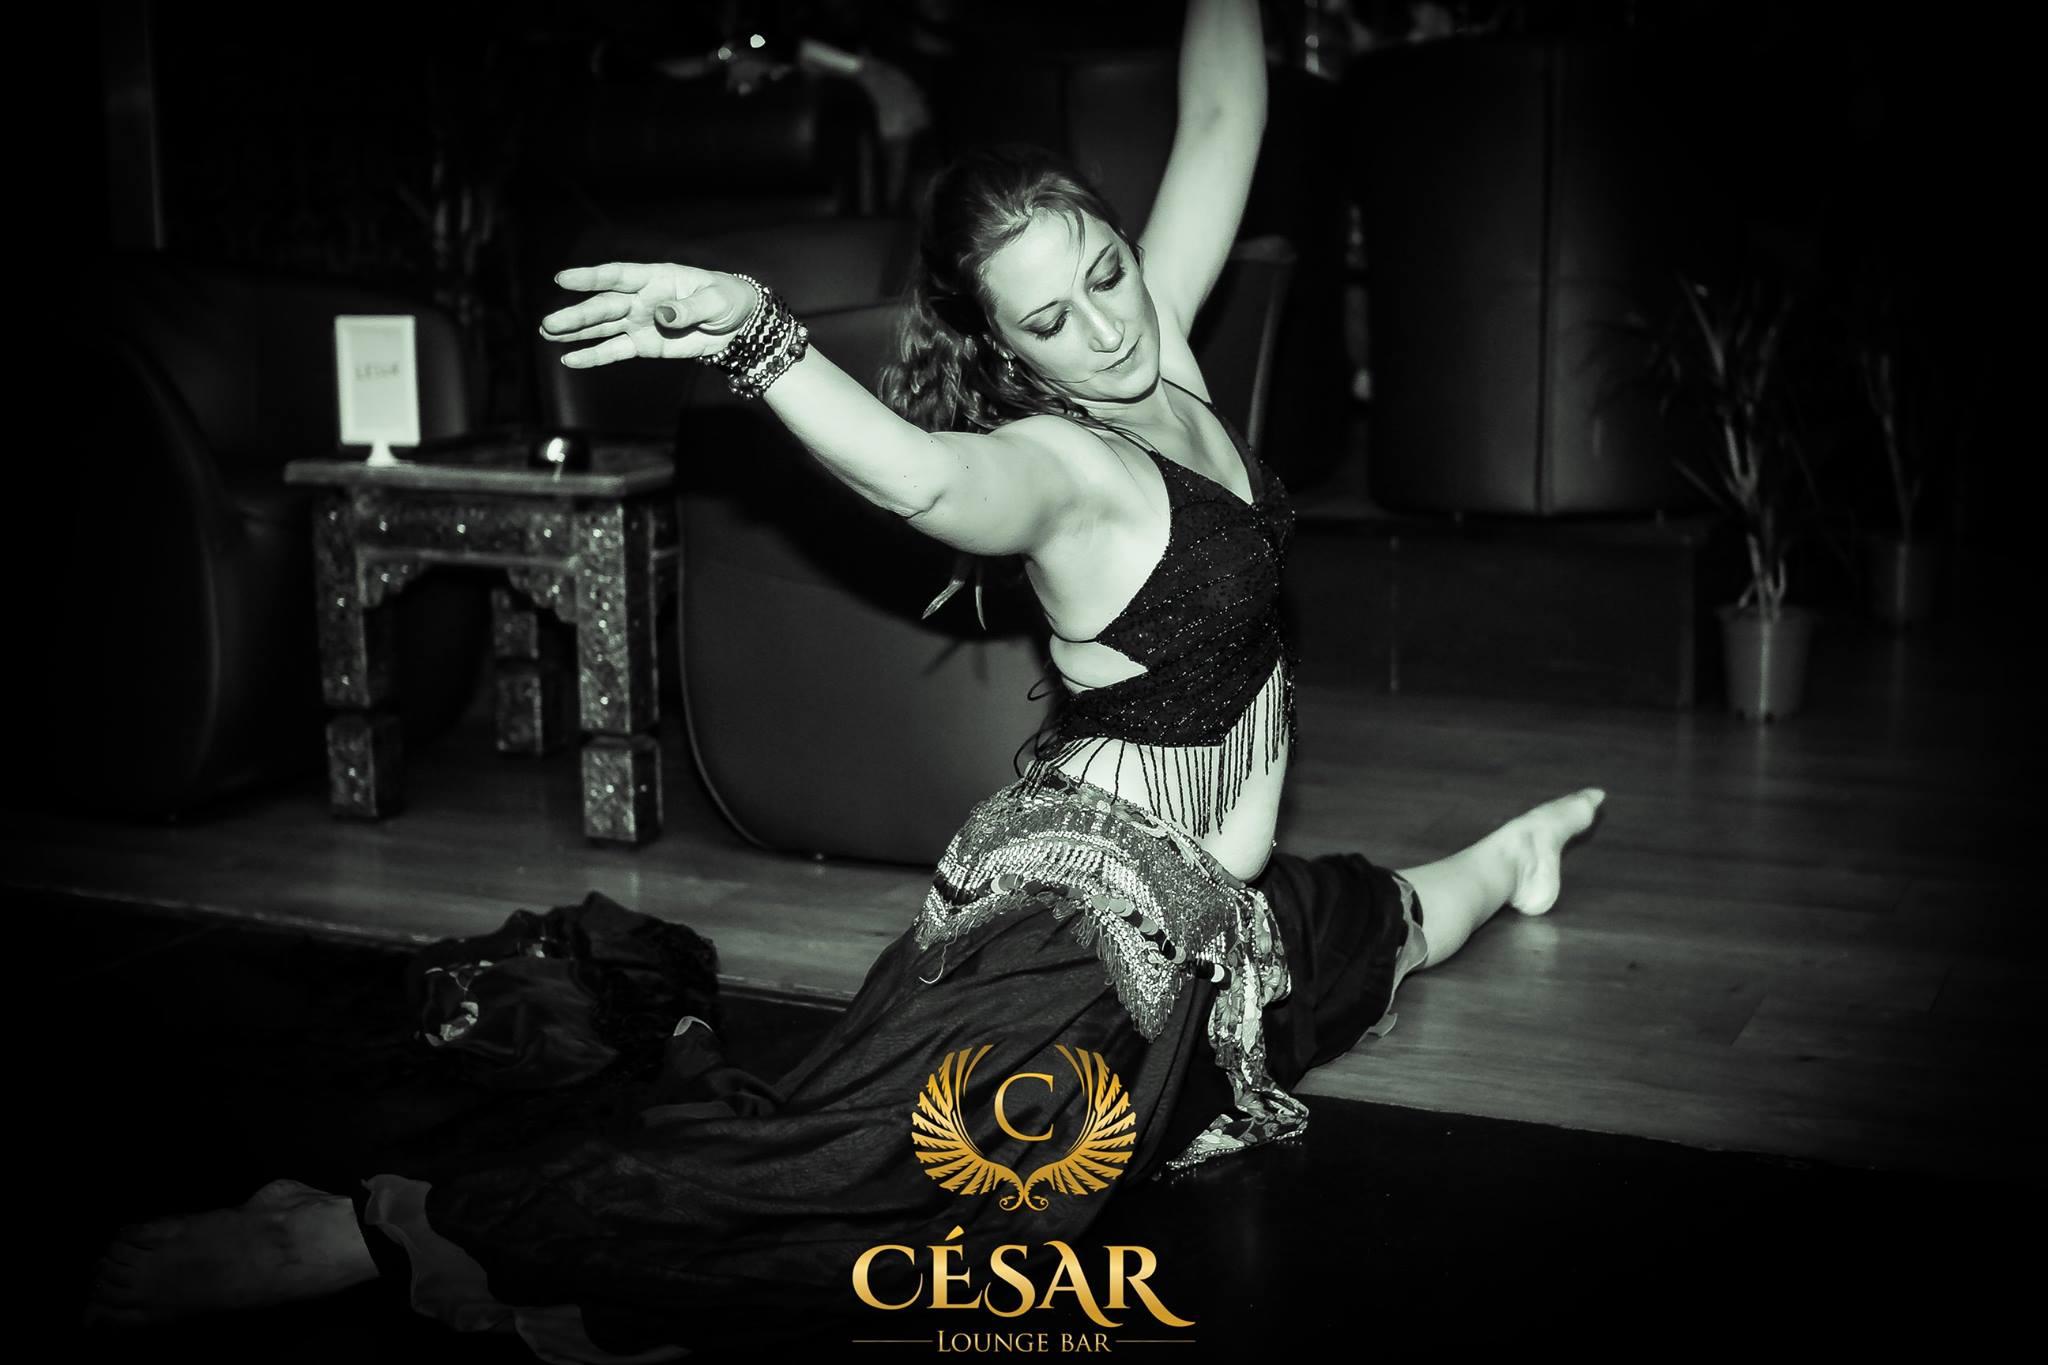 photo divers salsa kara dance